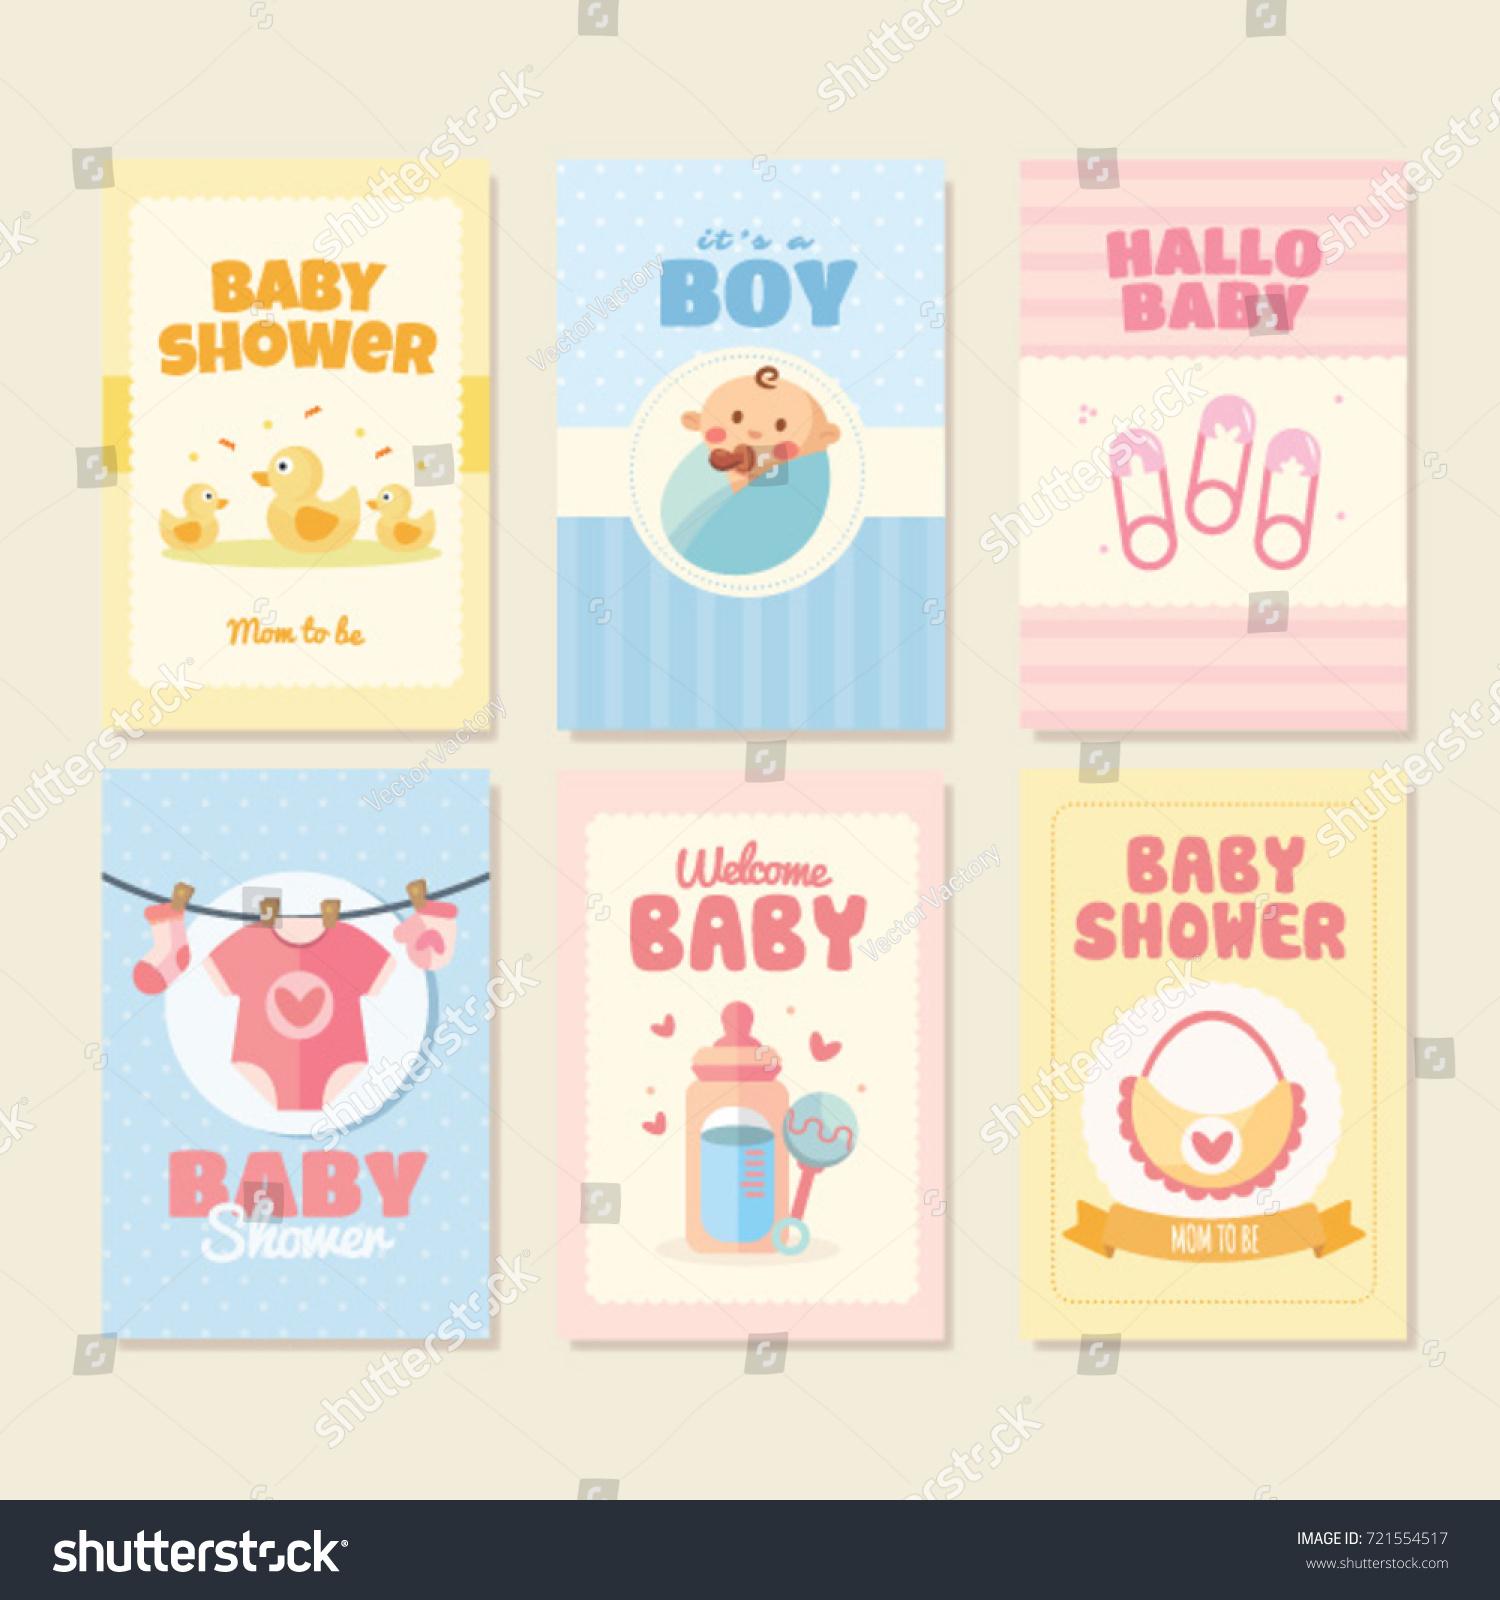 Happy Birthday Holiday Baby Shower Celebration Stock Vector